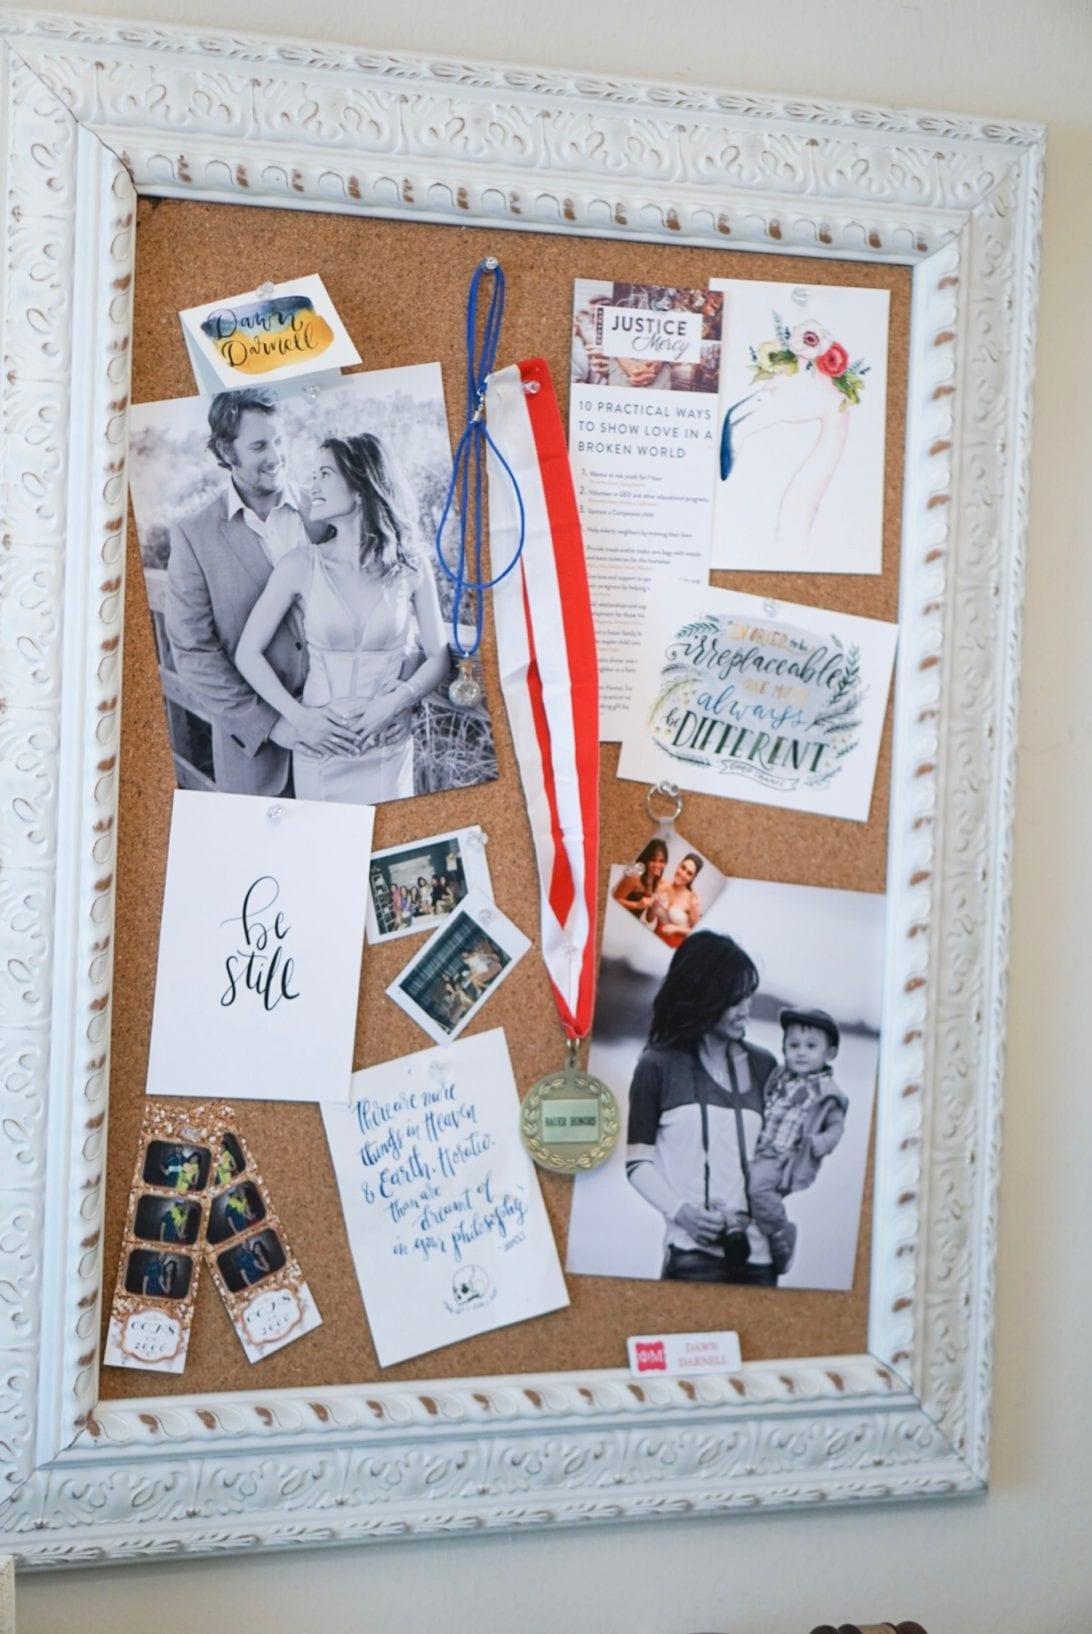 inspiration wall, cork board, home decor, office decor